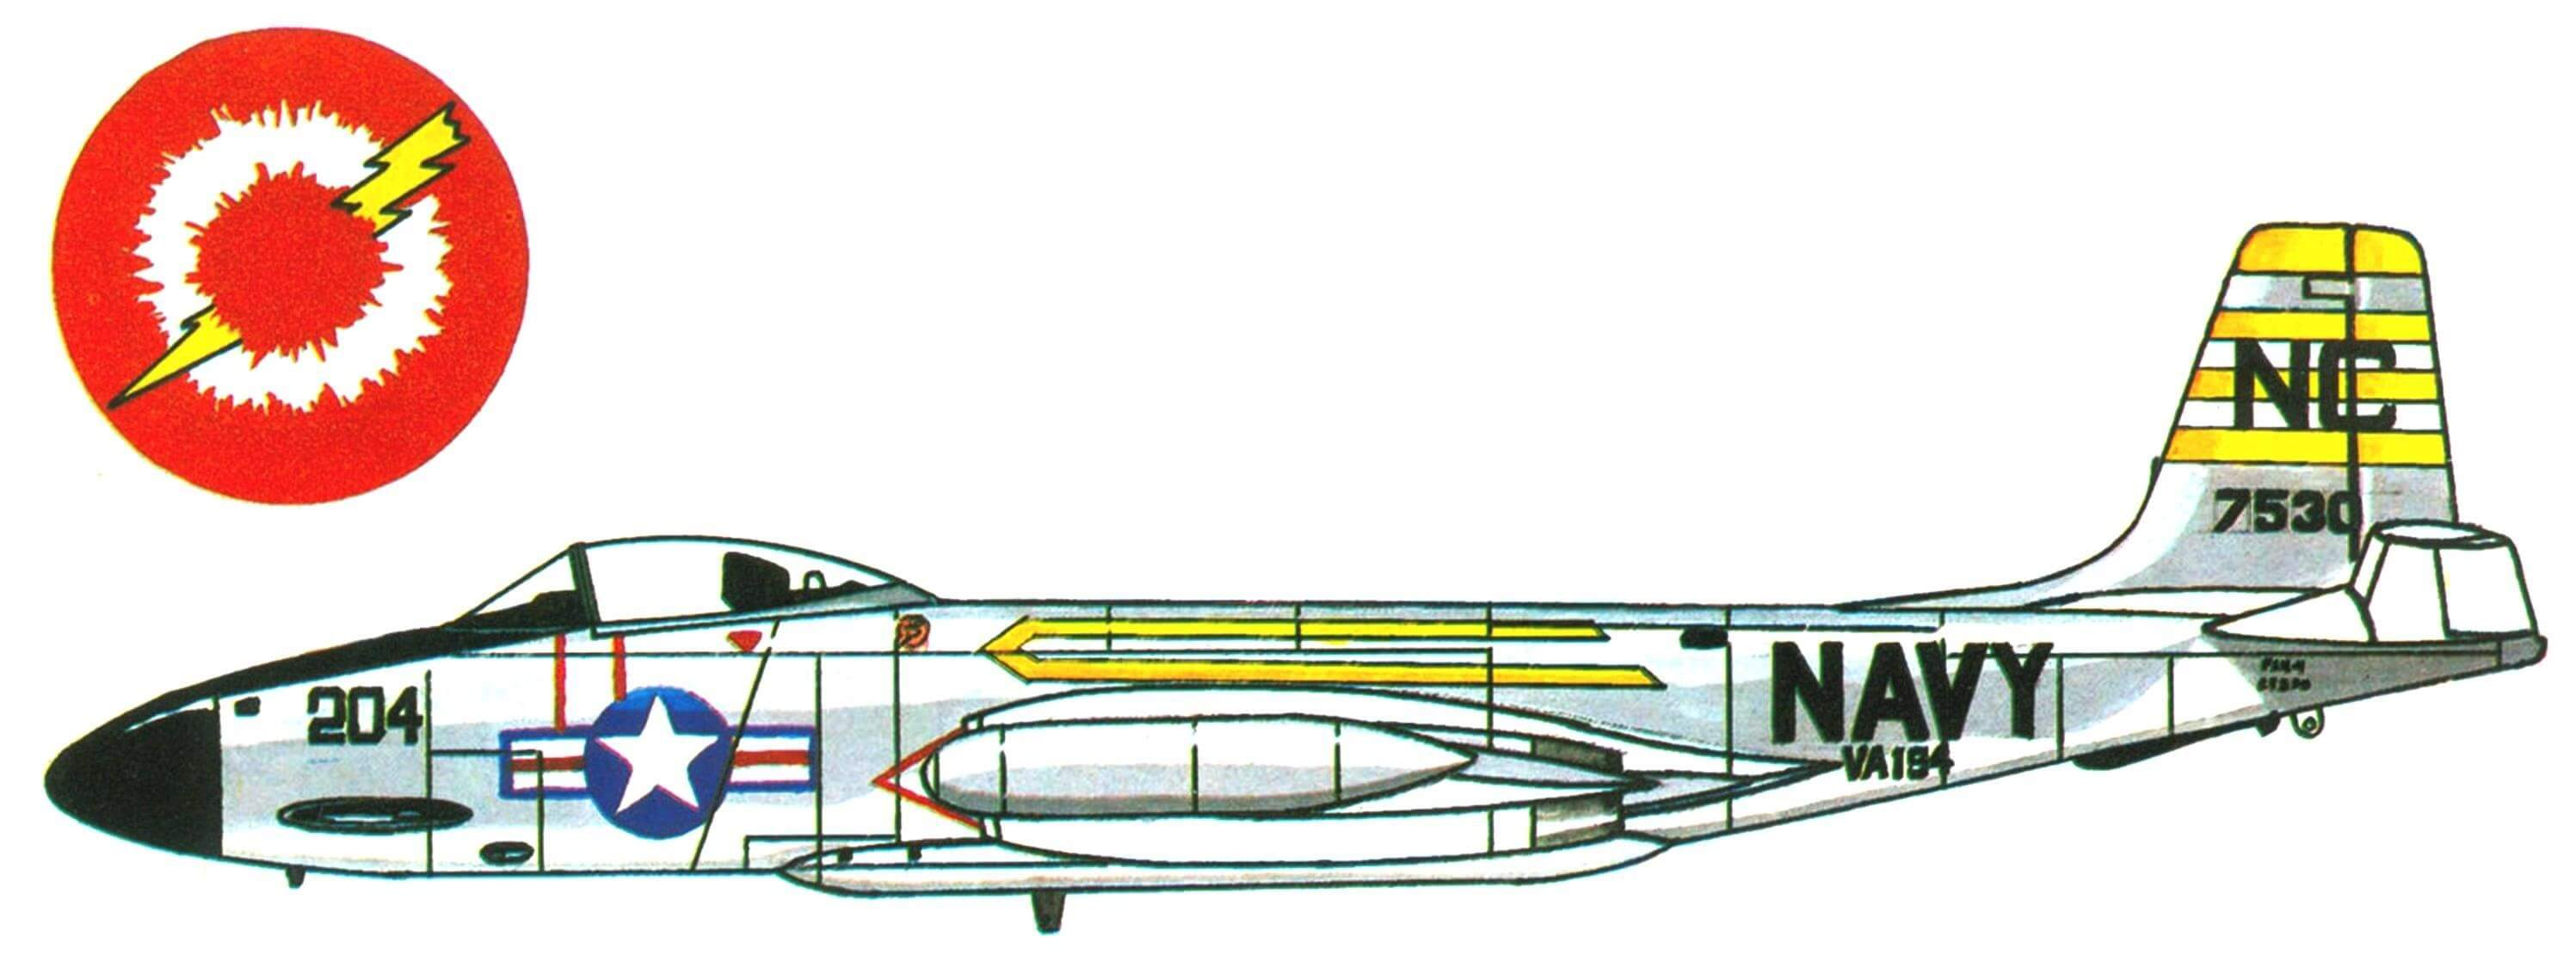 F2H-3 «Бенши» эскадрильи VA-194, авианосец «Кирсардж», 1957 год.